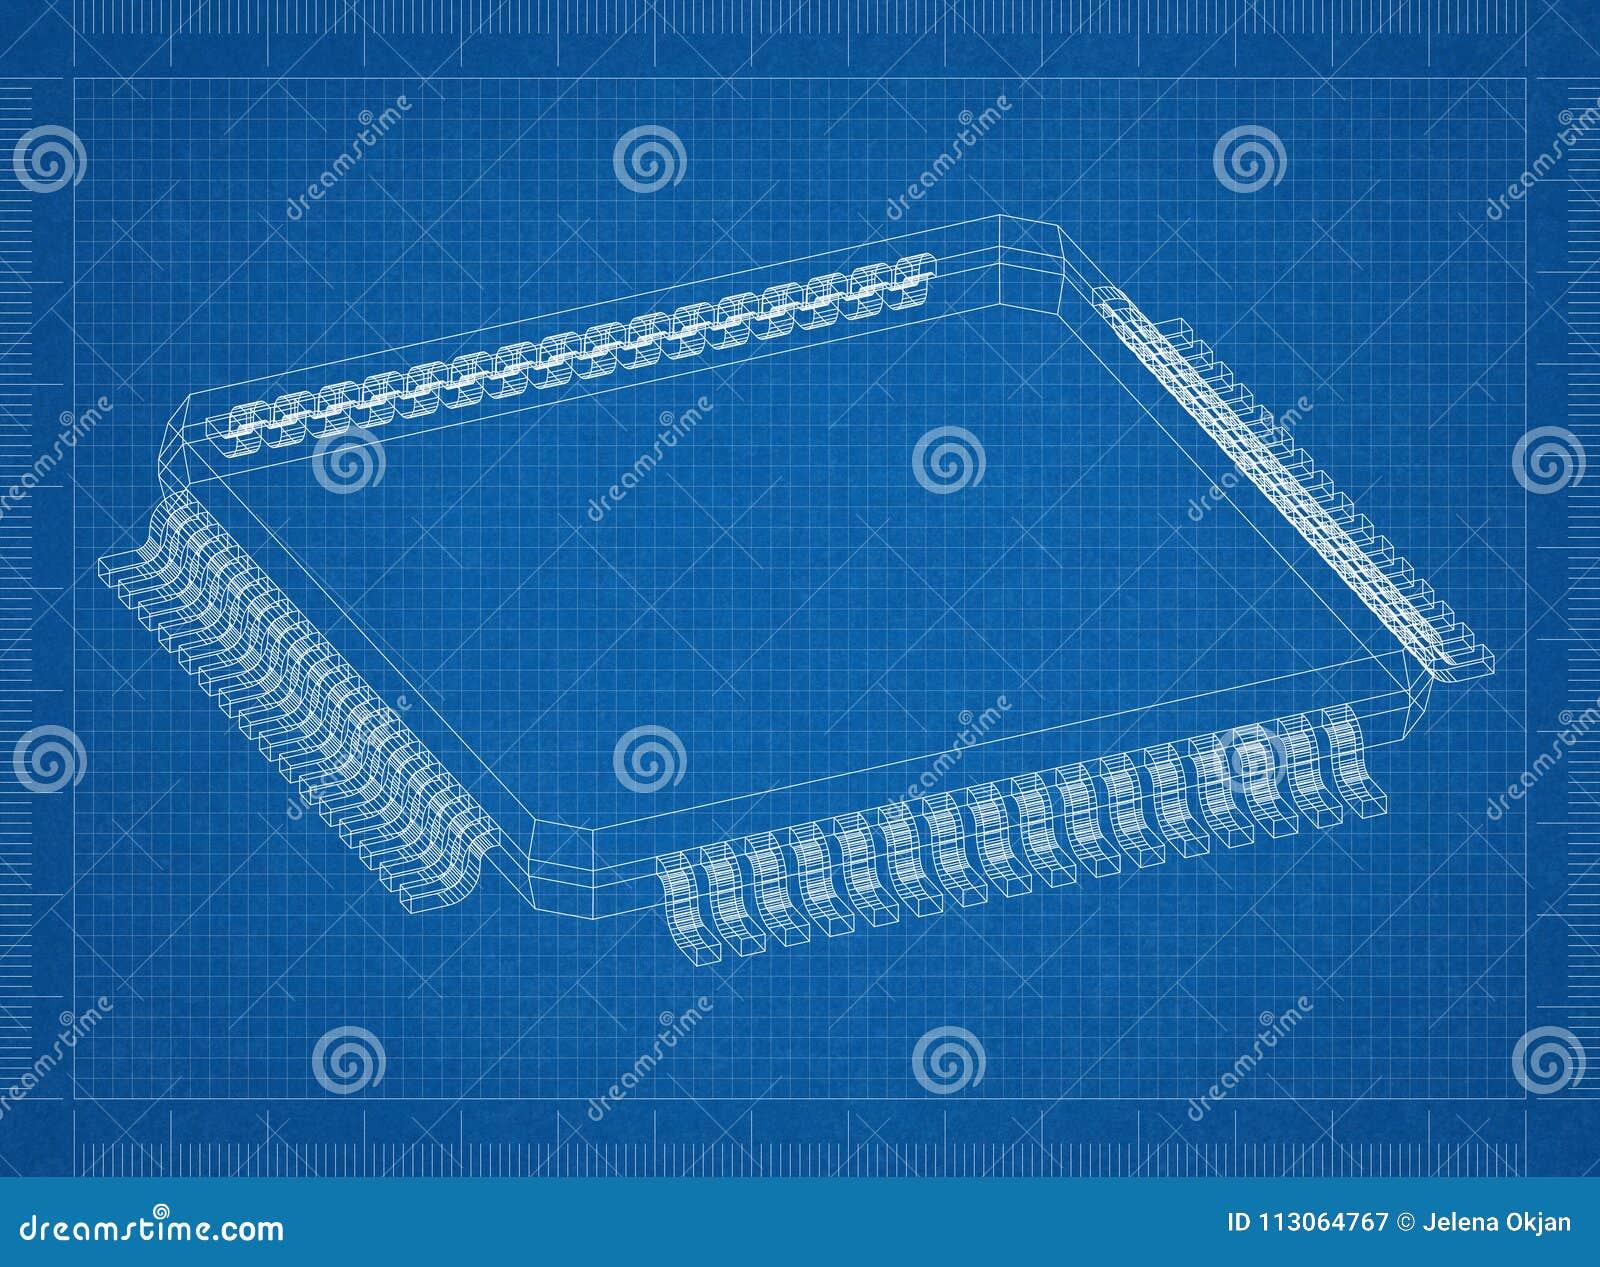 Computer Chip 3D Blueprint - Stock Image - Image of hardware